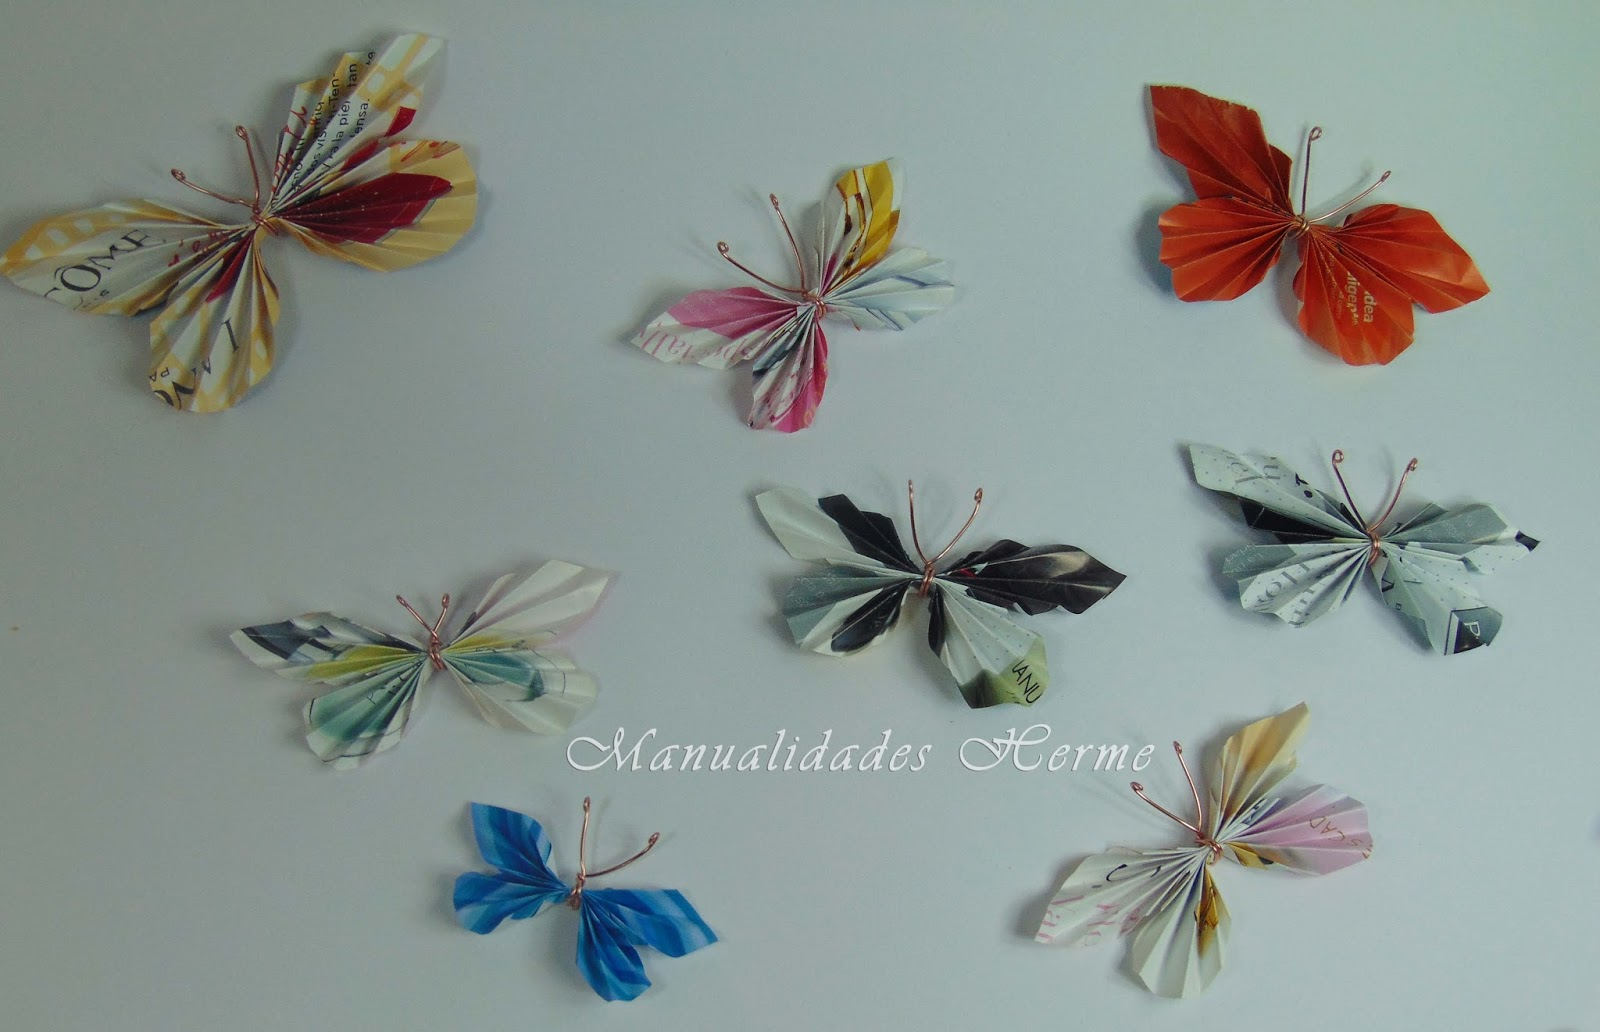 Manualidades herme hacer mariposas con papel de revista for Decoracion con cenefas de papel